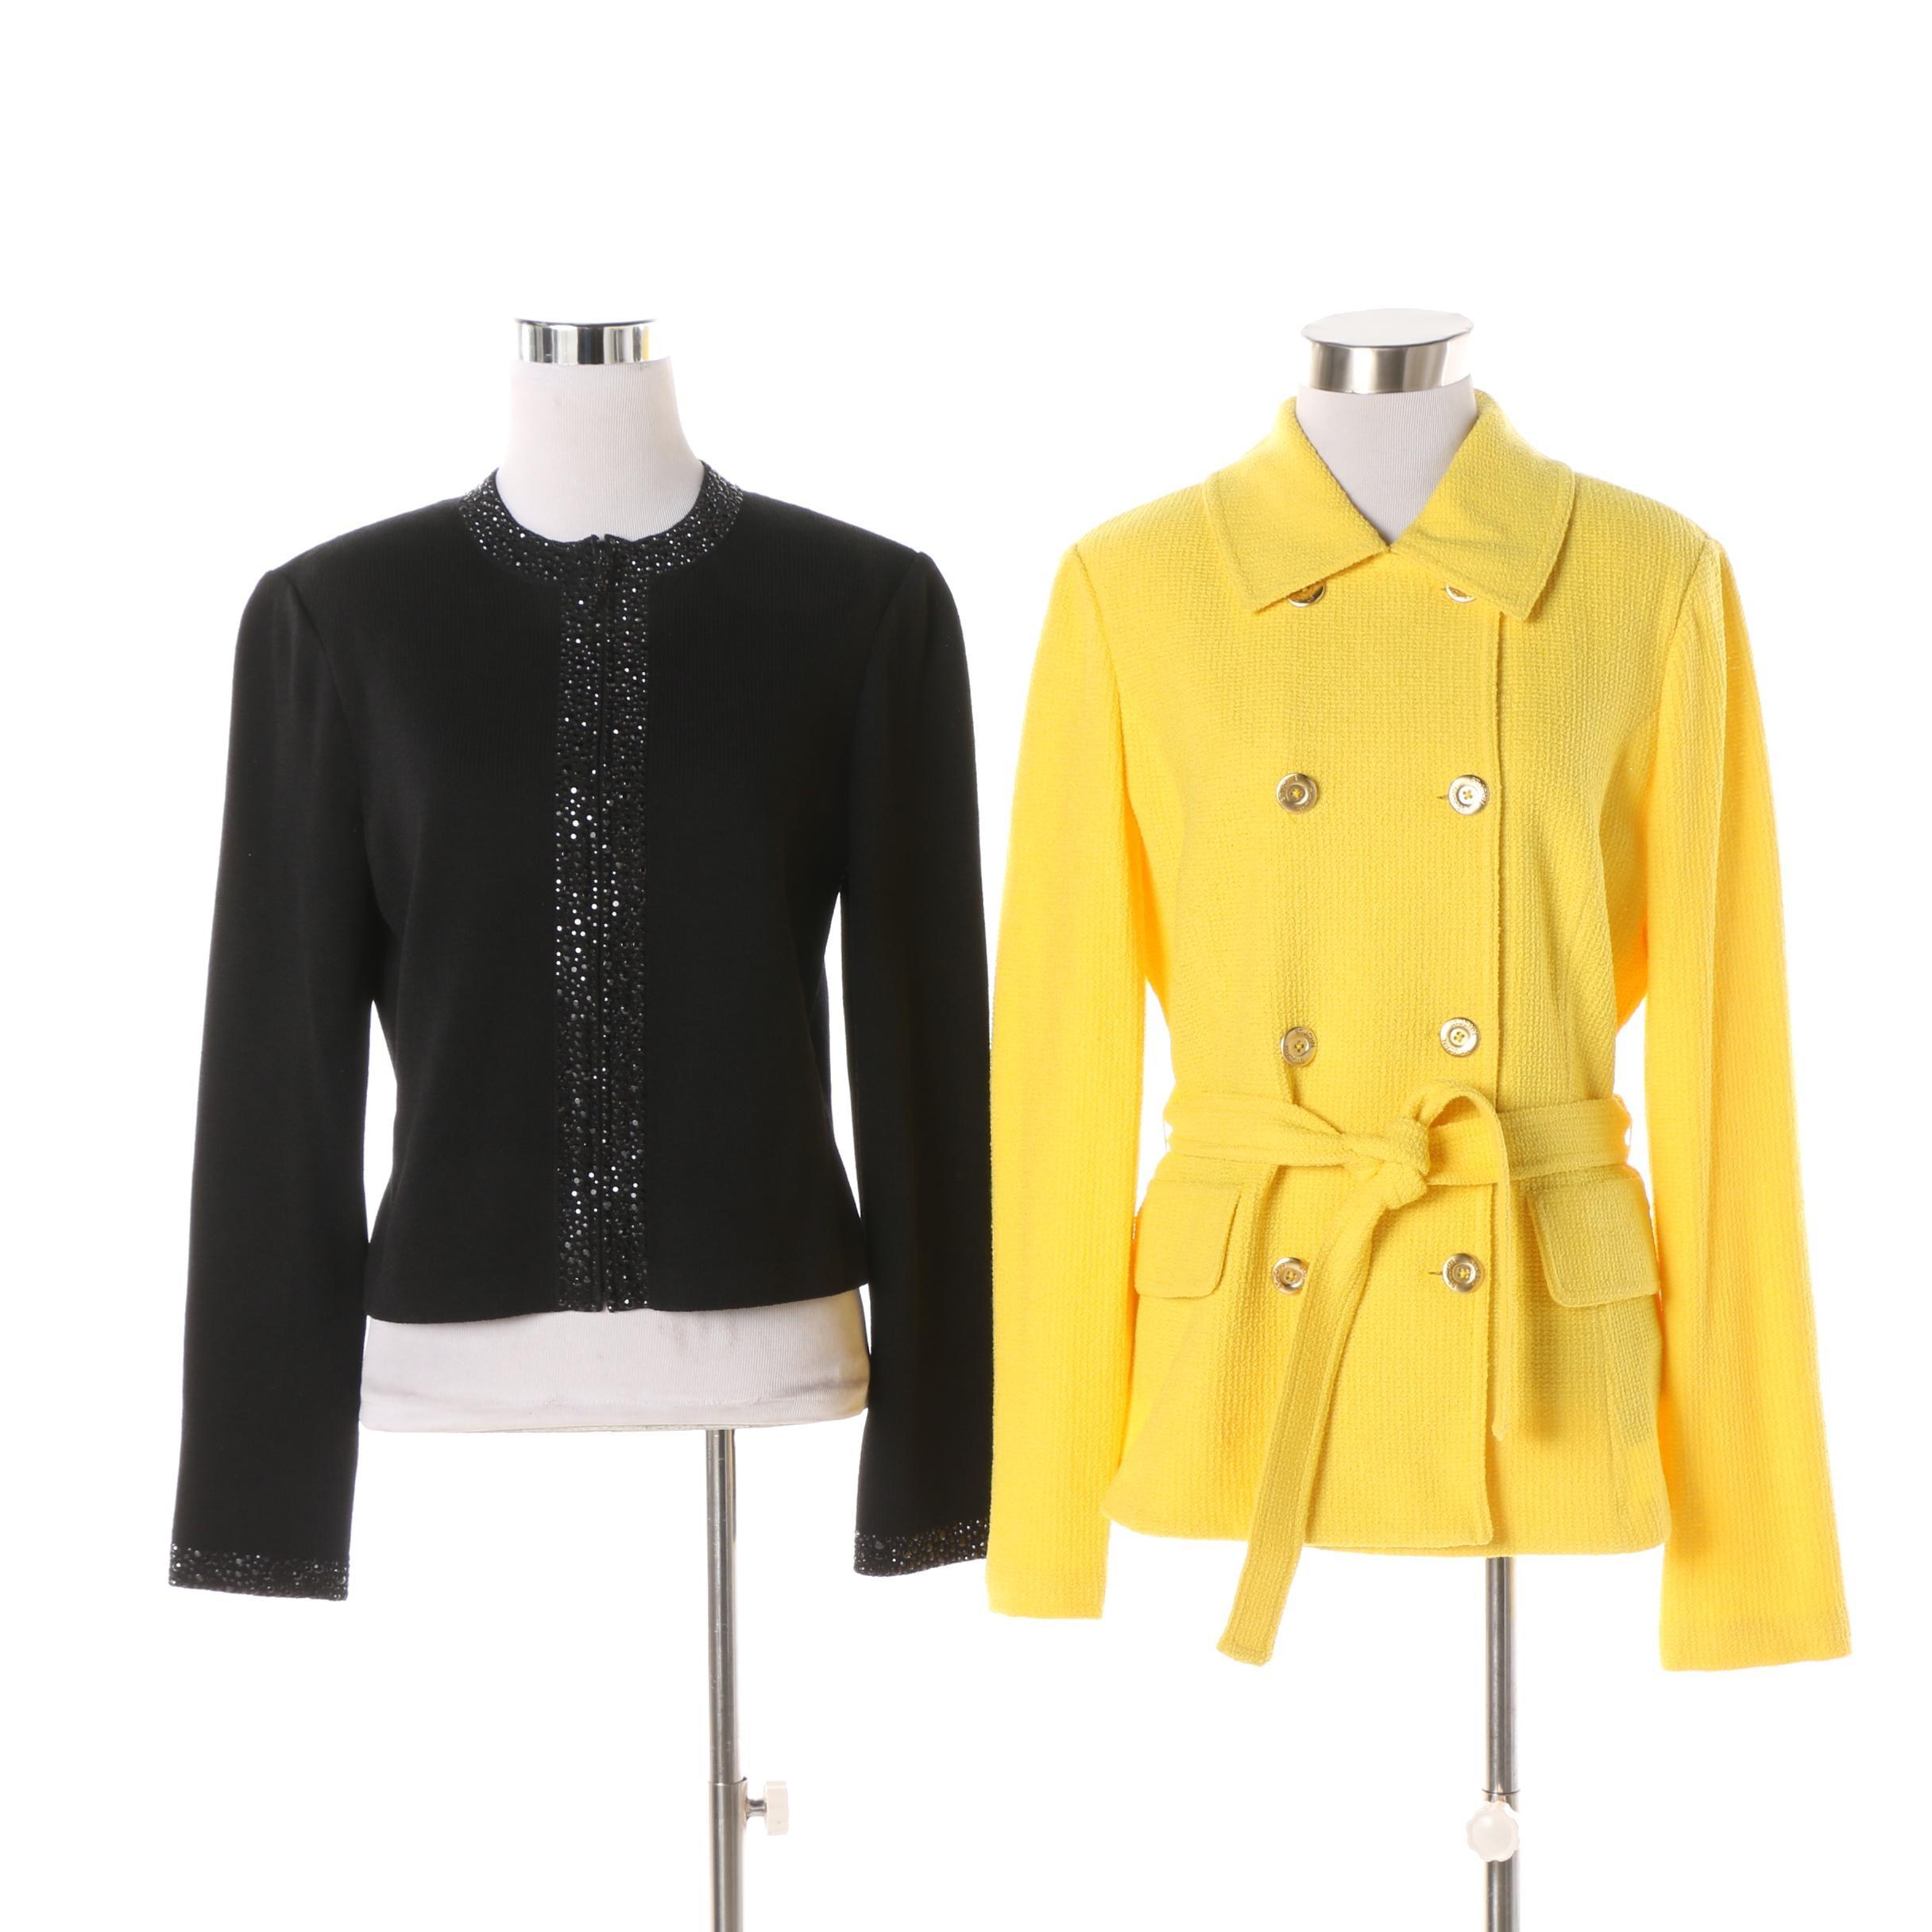 Women's St. John Yellow Knit Jacket and St. John Boutique Beaded Black Cardigan